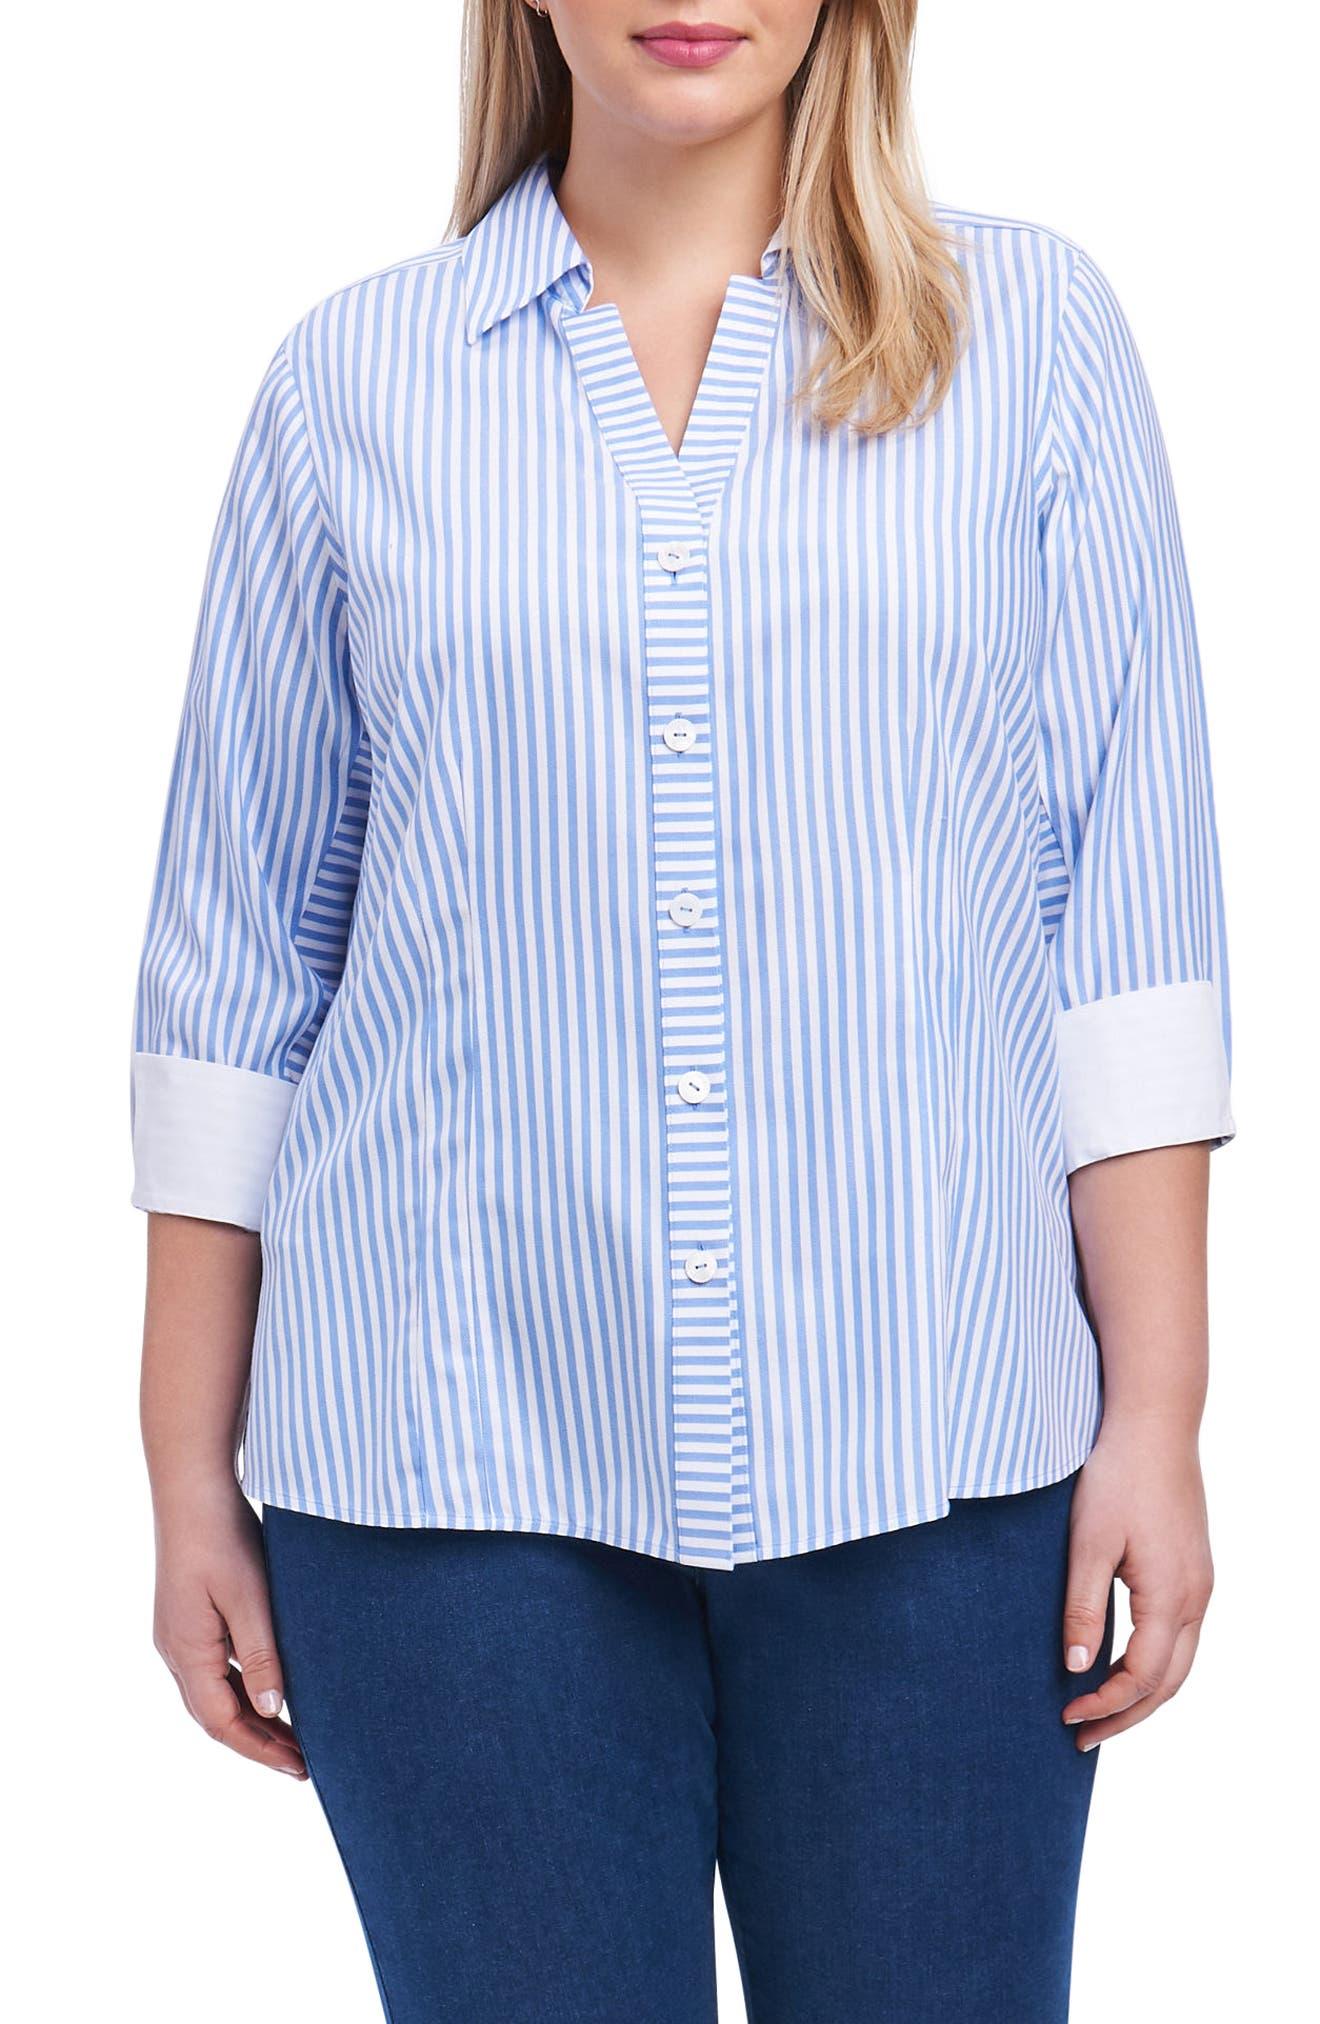 Main Image - Foxcroft Taylor Button Down Shirt (Plus Size)